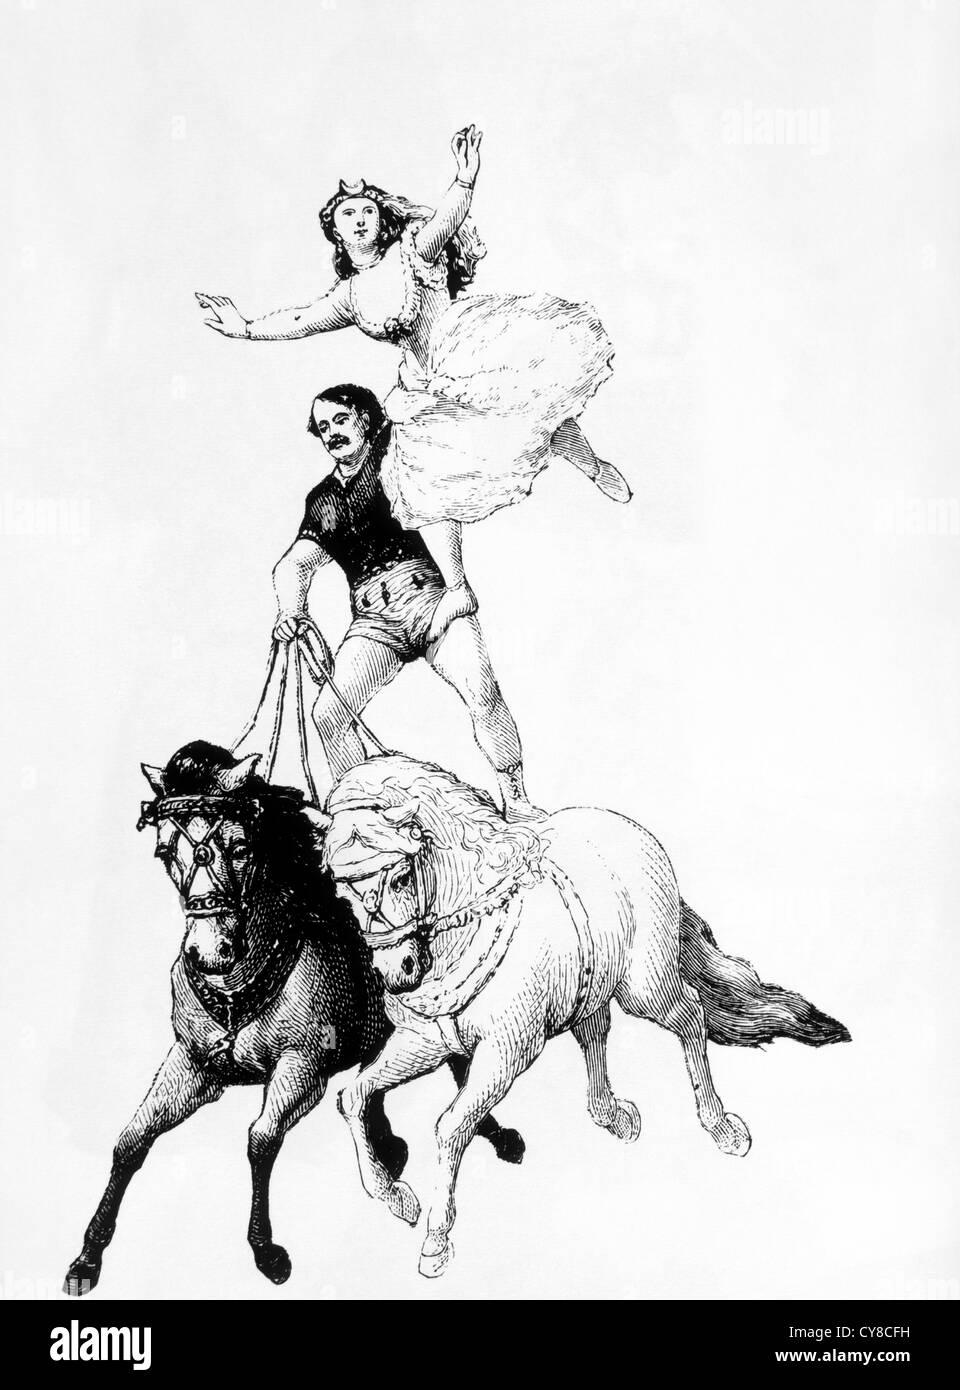 Man and Woman Bareback Horse Riding, Woodcut, 19th Century - Stock Image